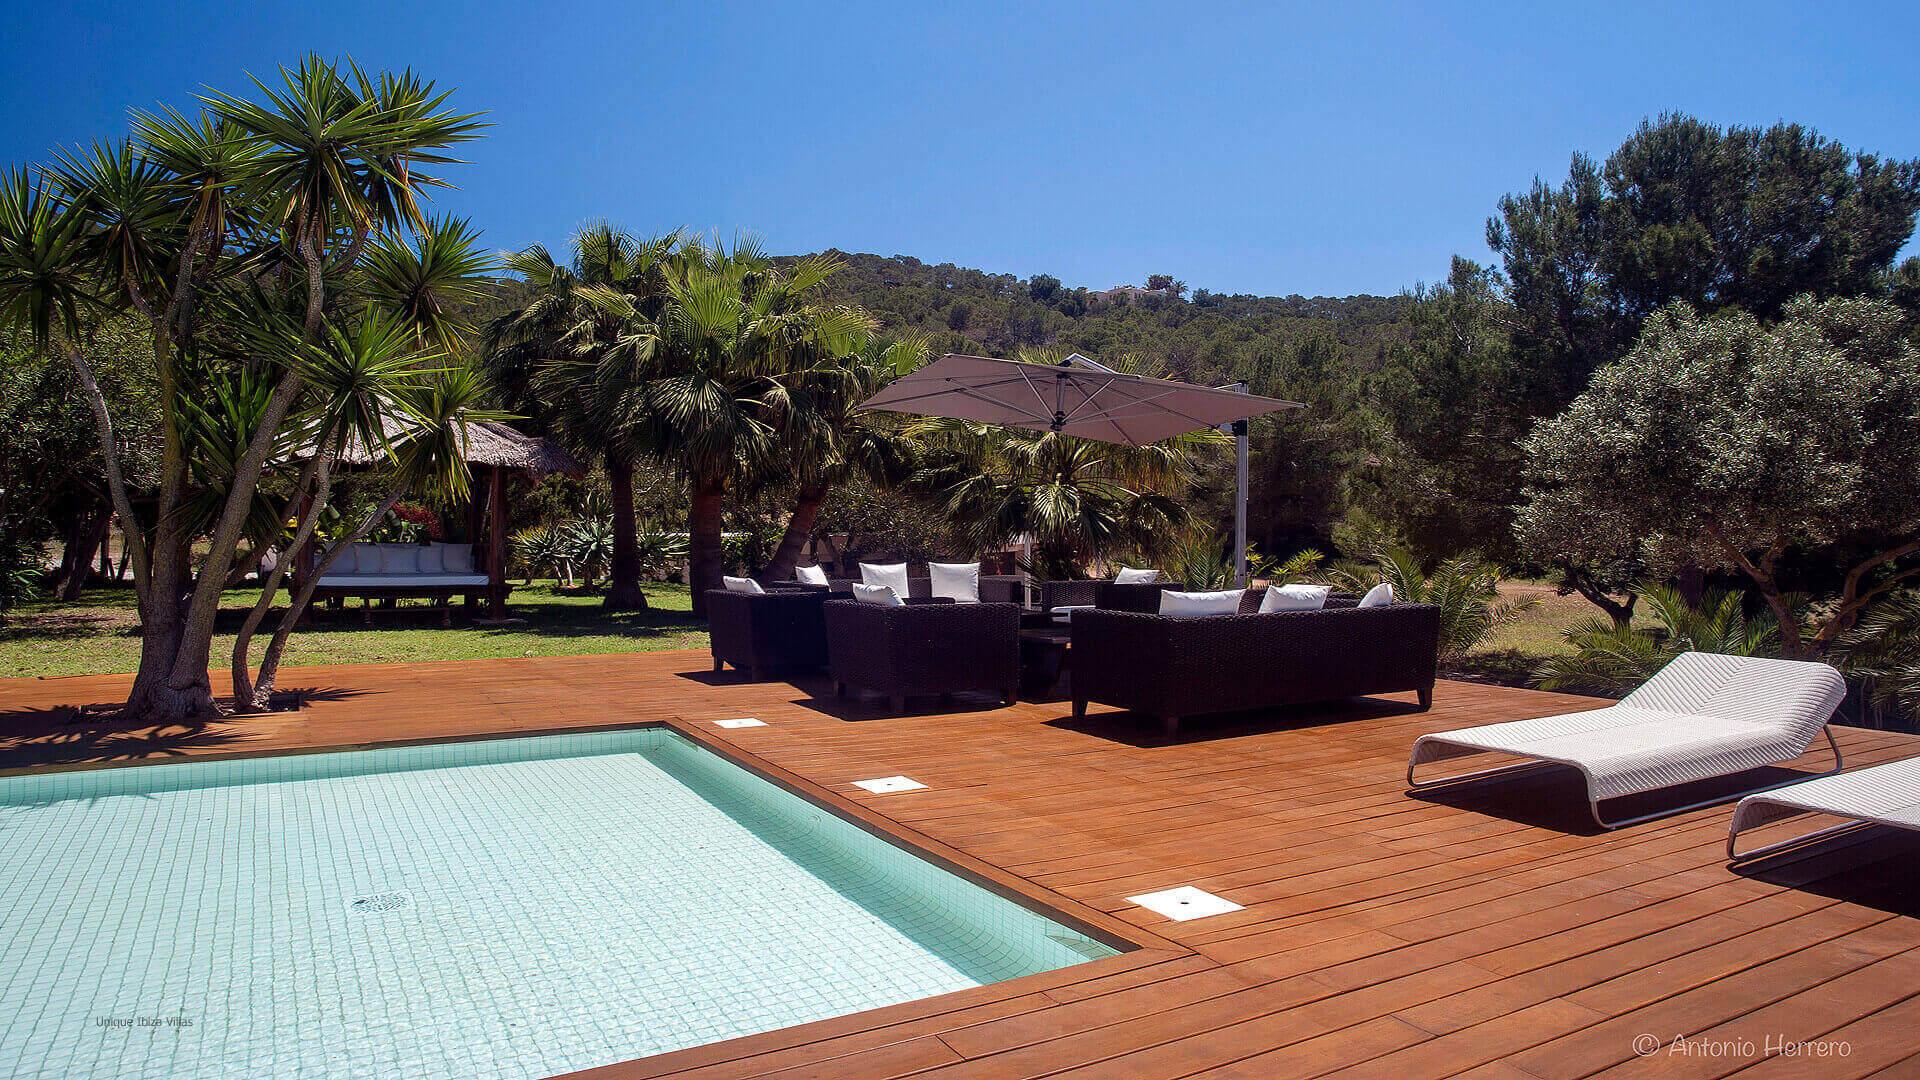 Villa located near Es Cavellet and Salinas beaches